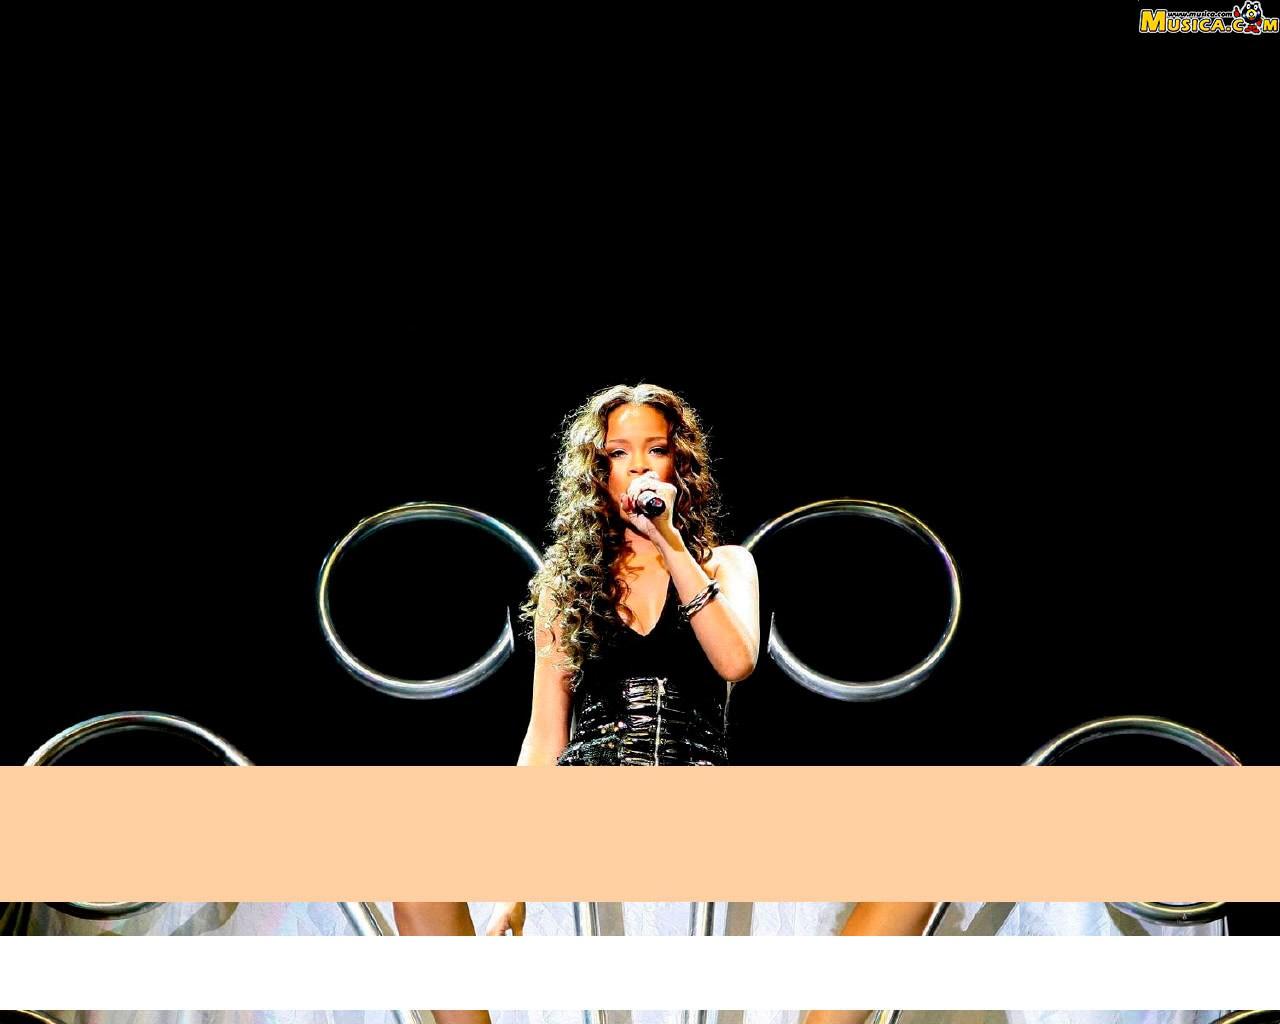 Fondo de escritorio de Rihanna